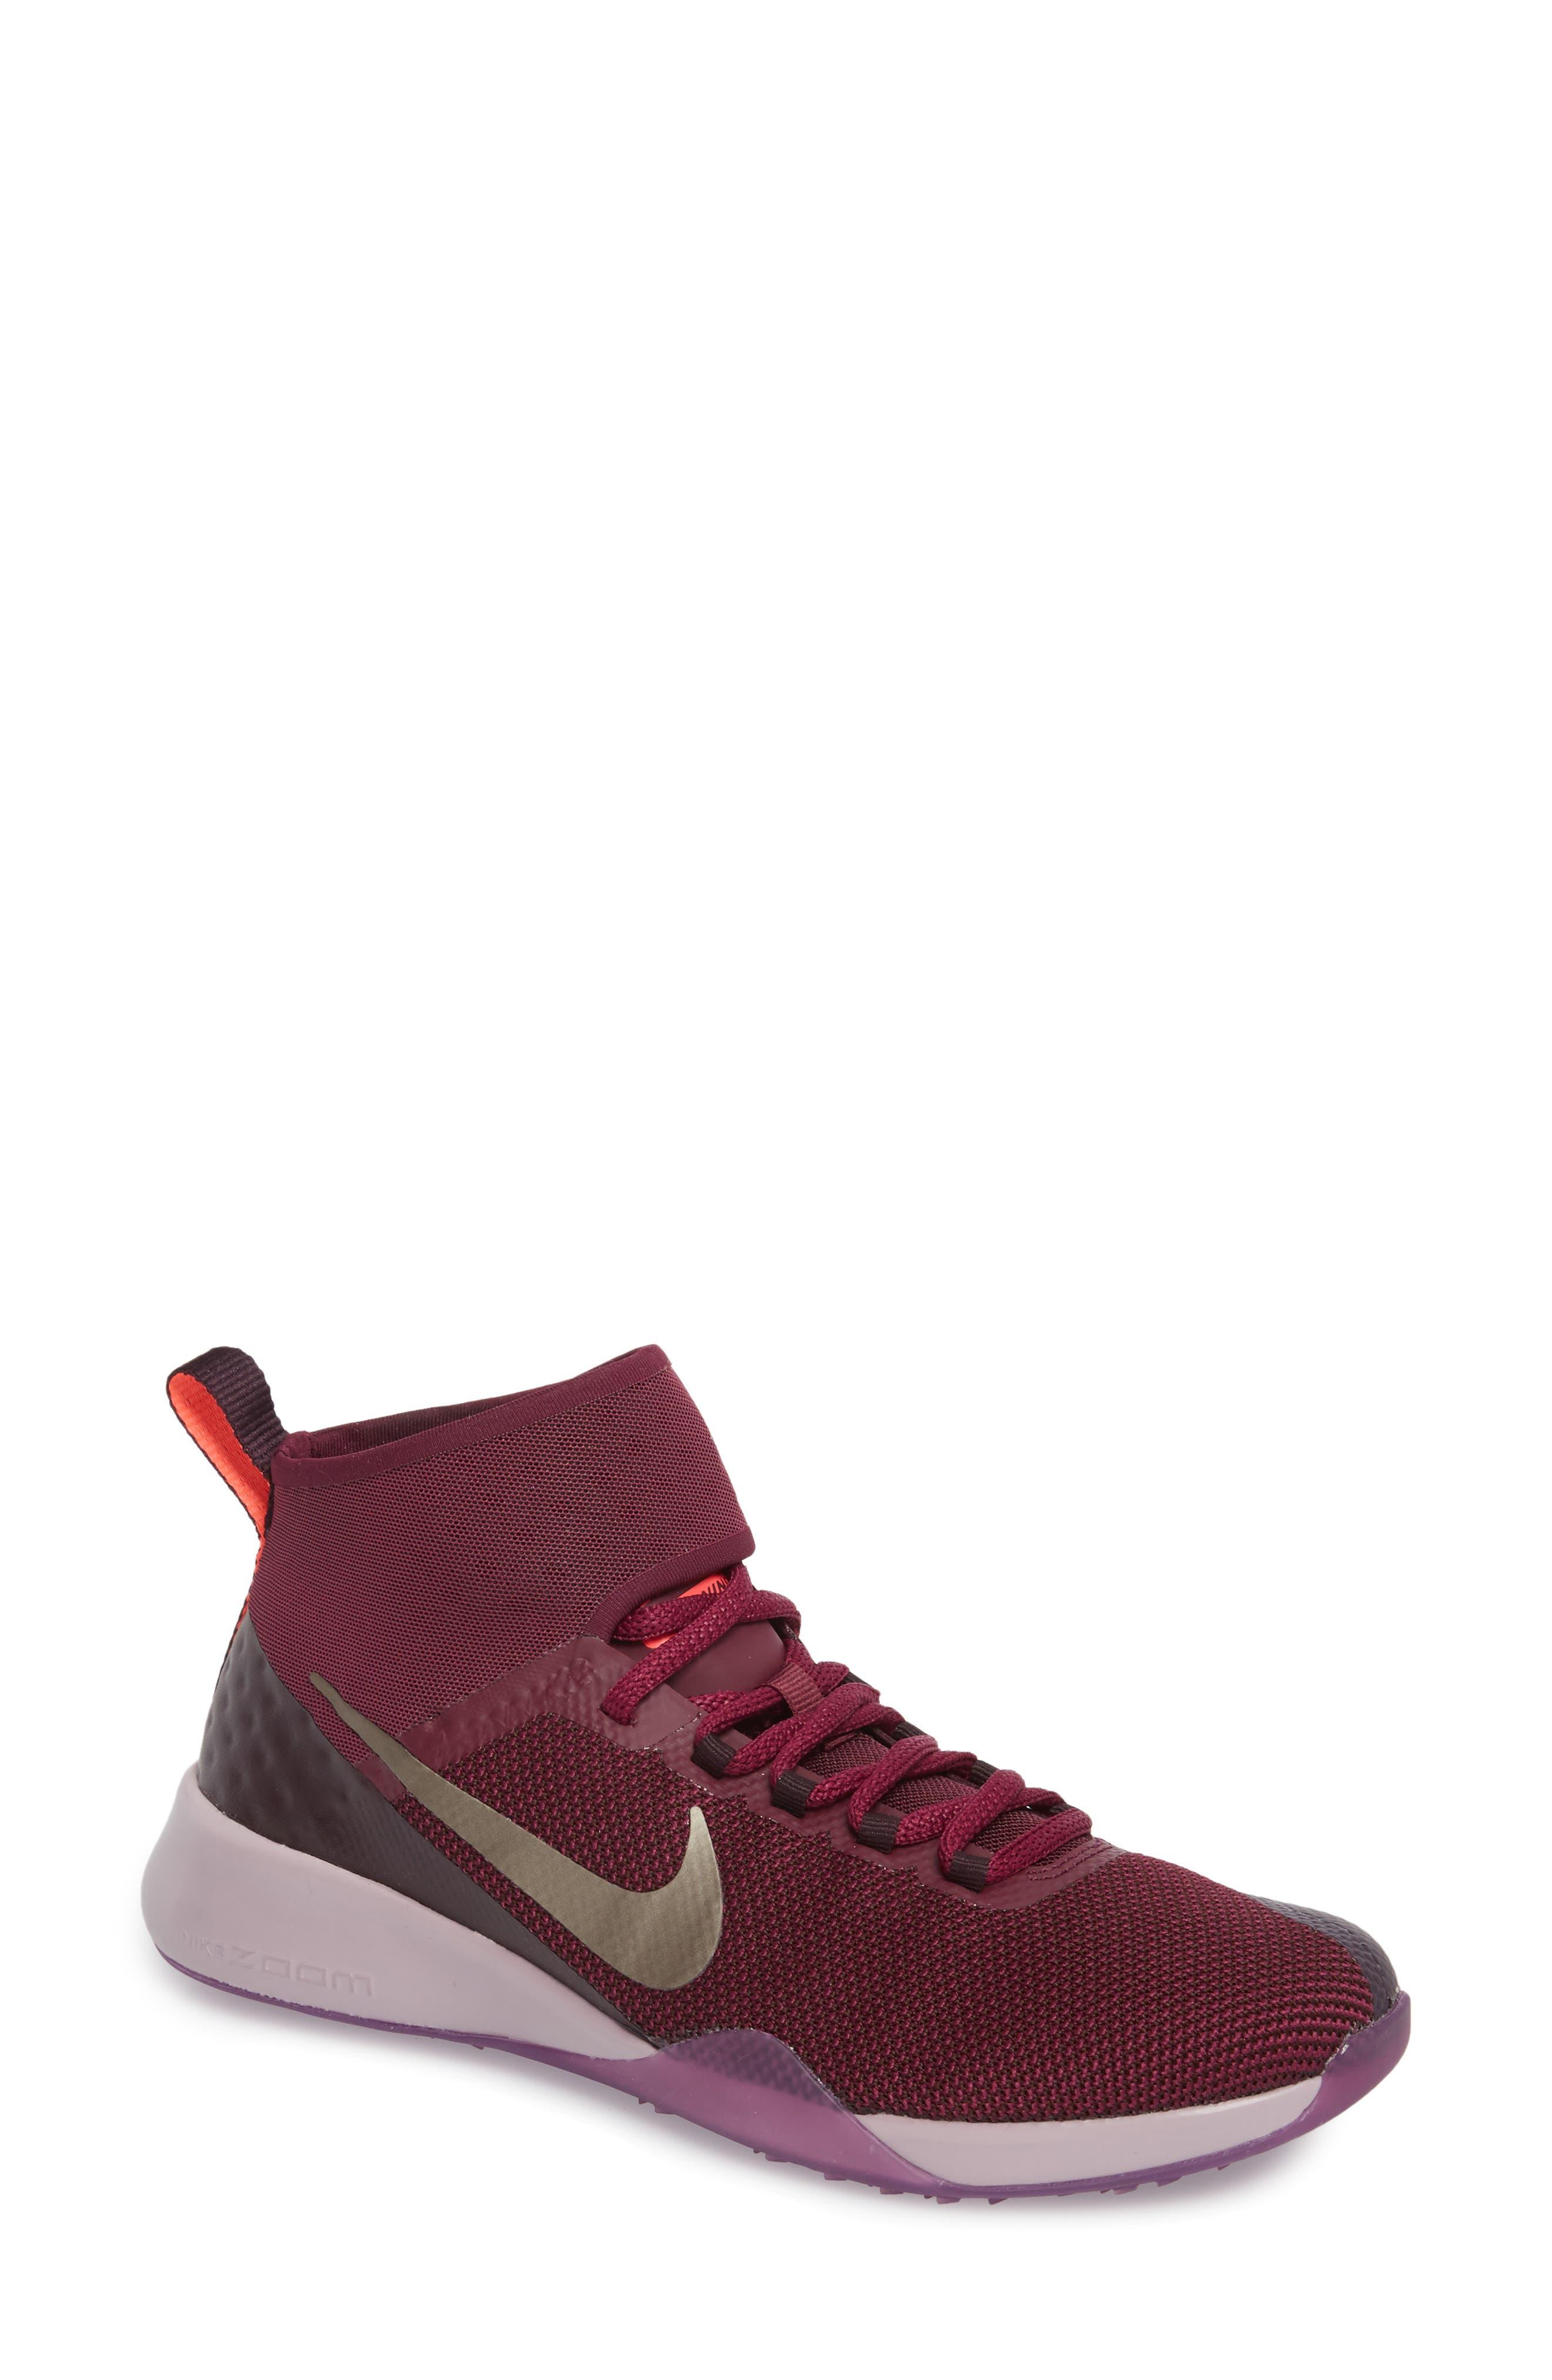 Air Zoom Strong 2 Gem Training Shoe,                             Main thumbnail 1, color,                             Bordeaux/ Metallic Pewter